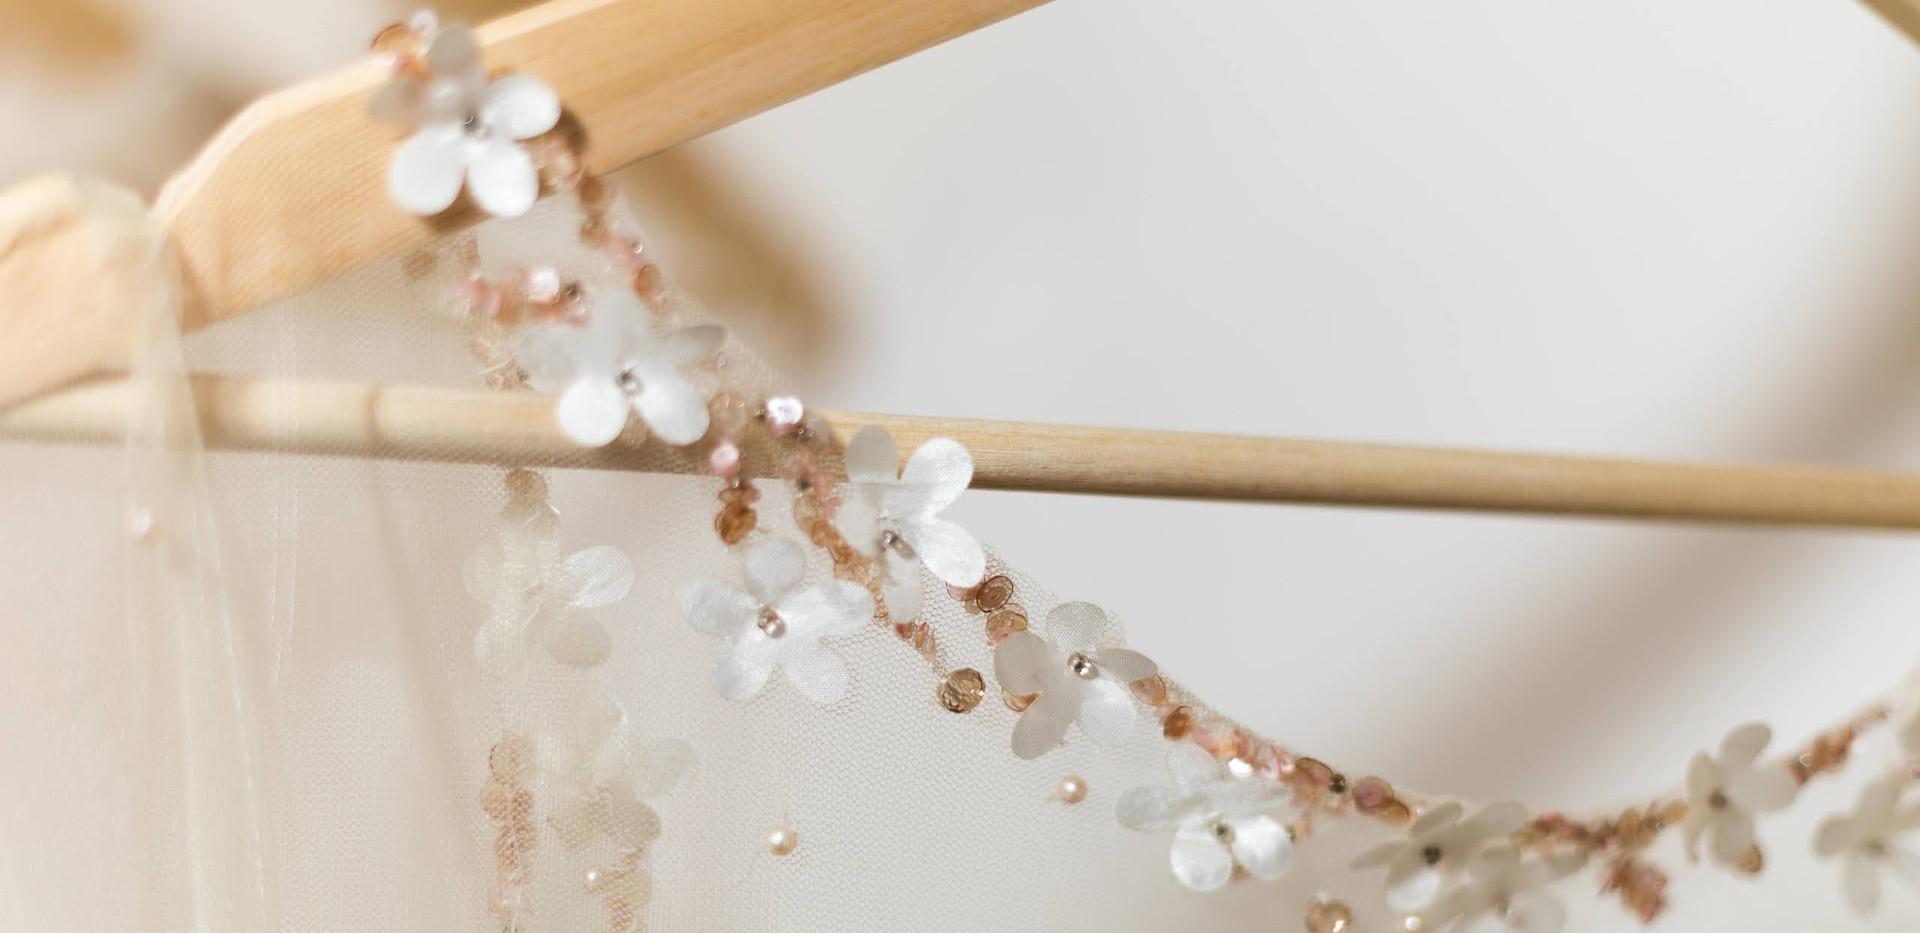 Neckline of wedding dress